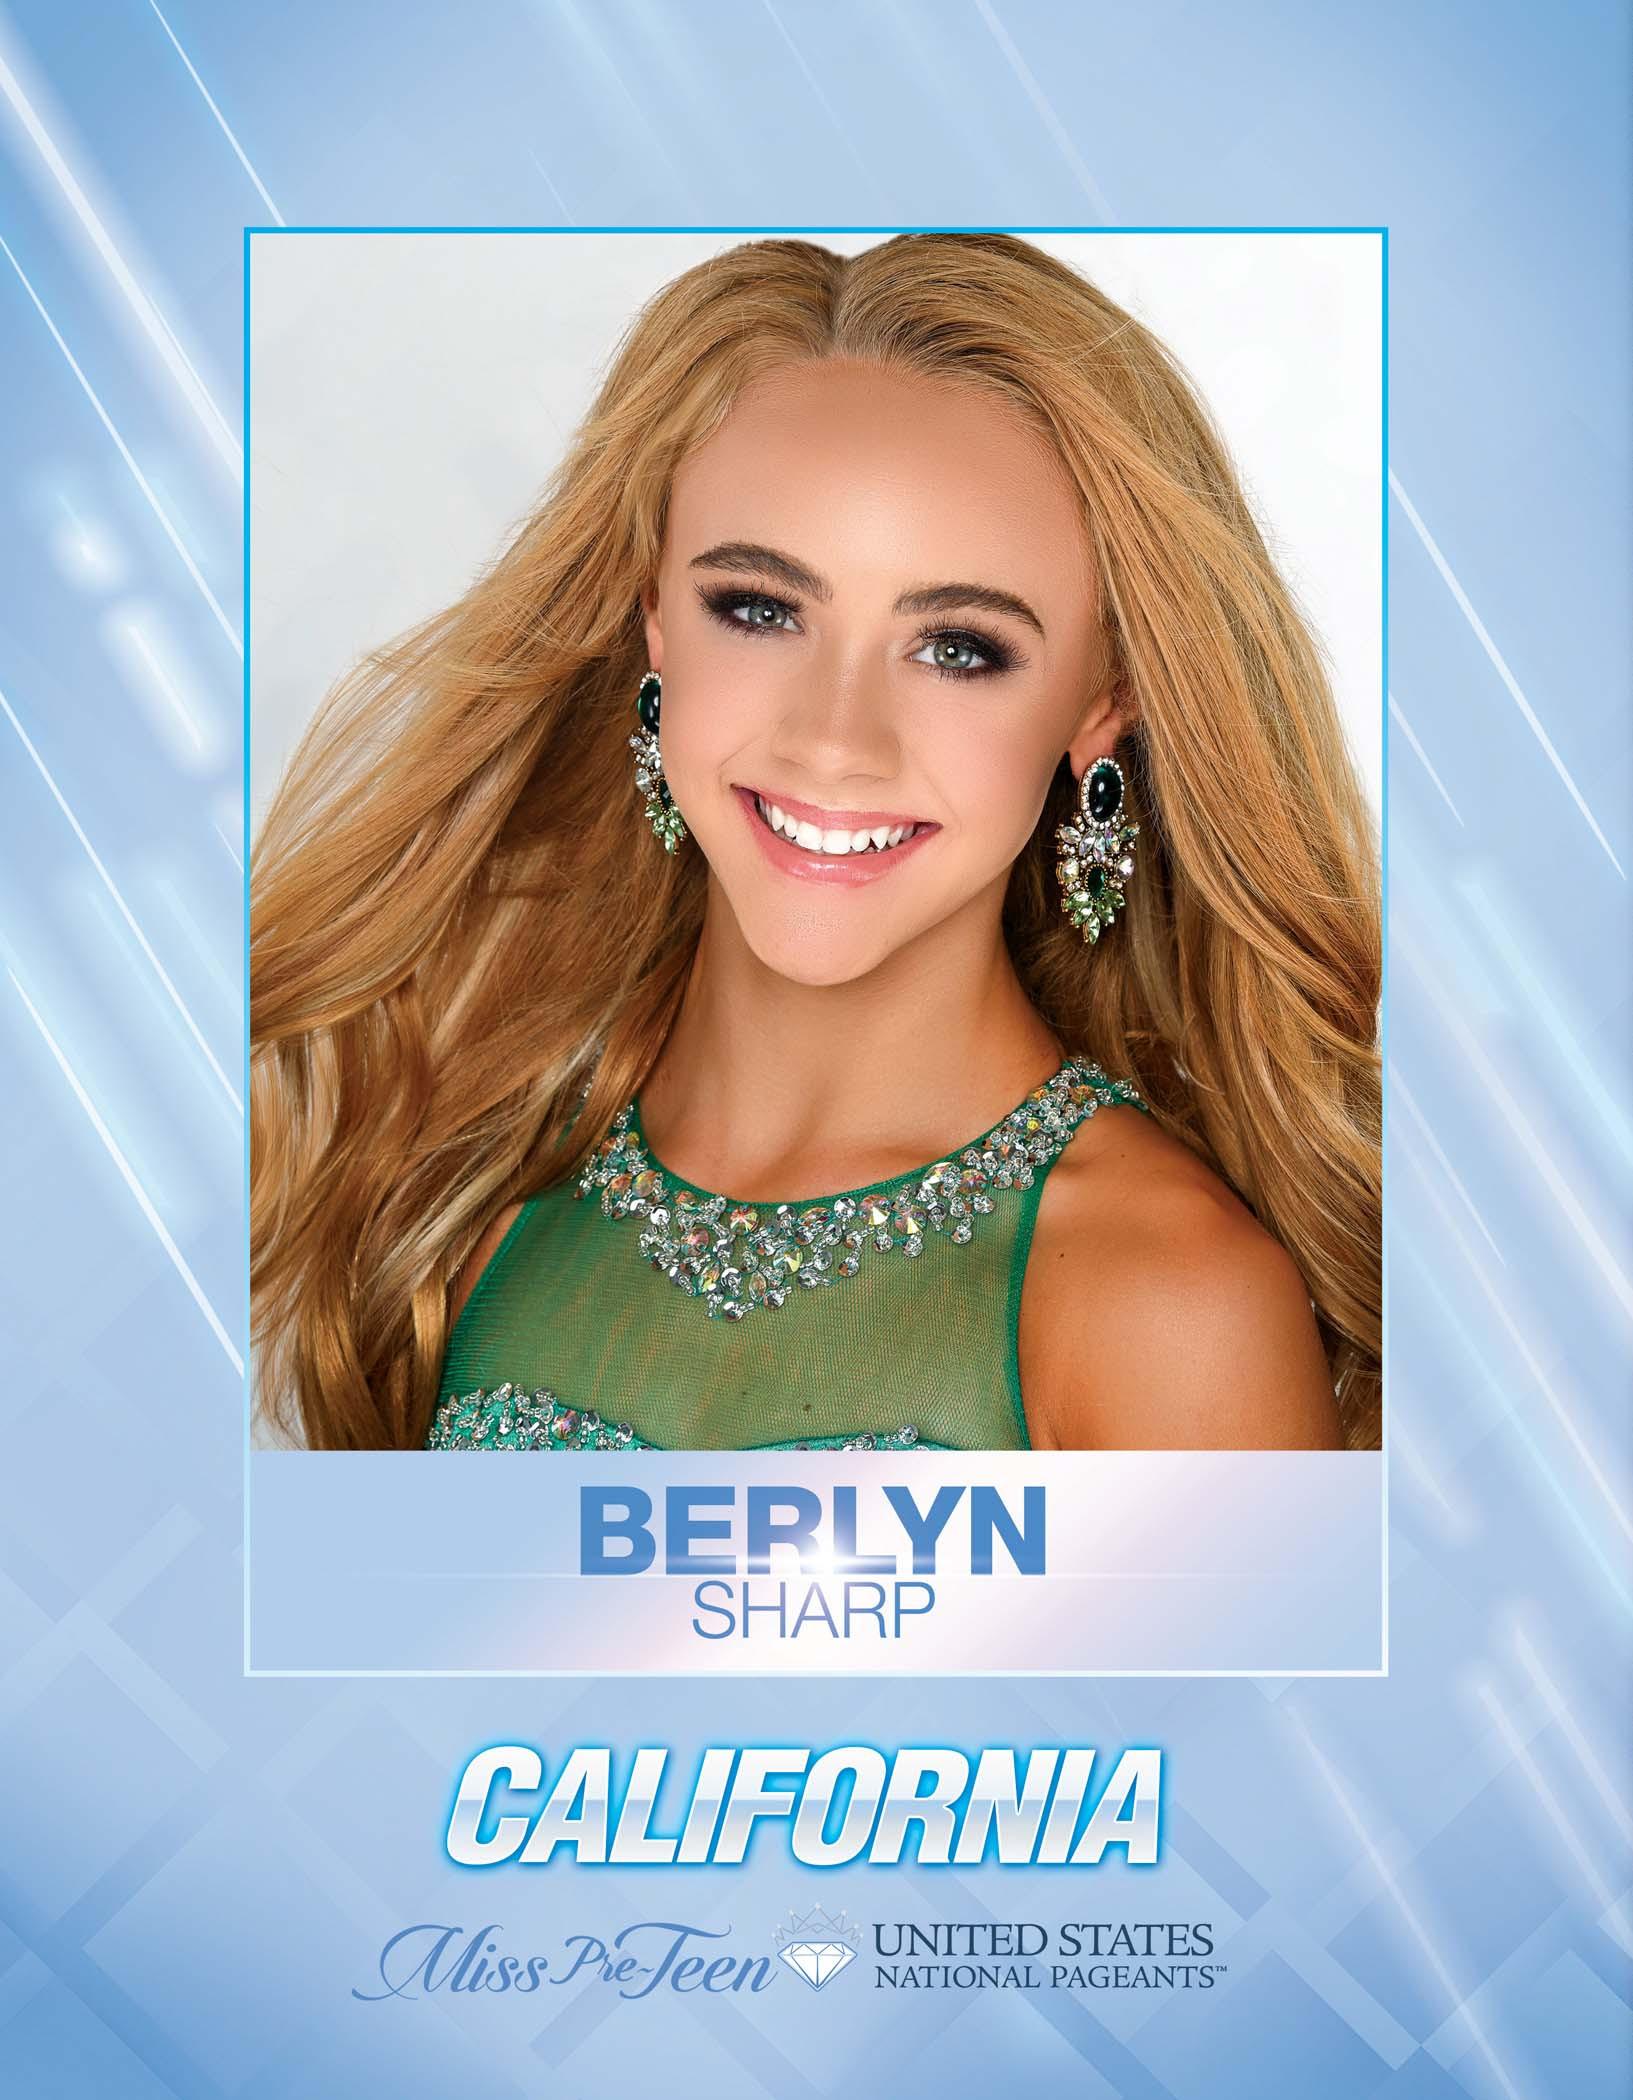 Berlyn Sharp Miss Pre-Teen California United States - 2021